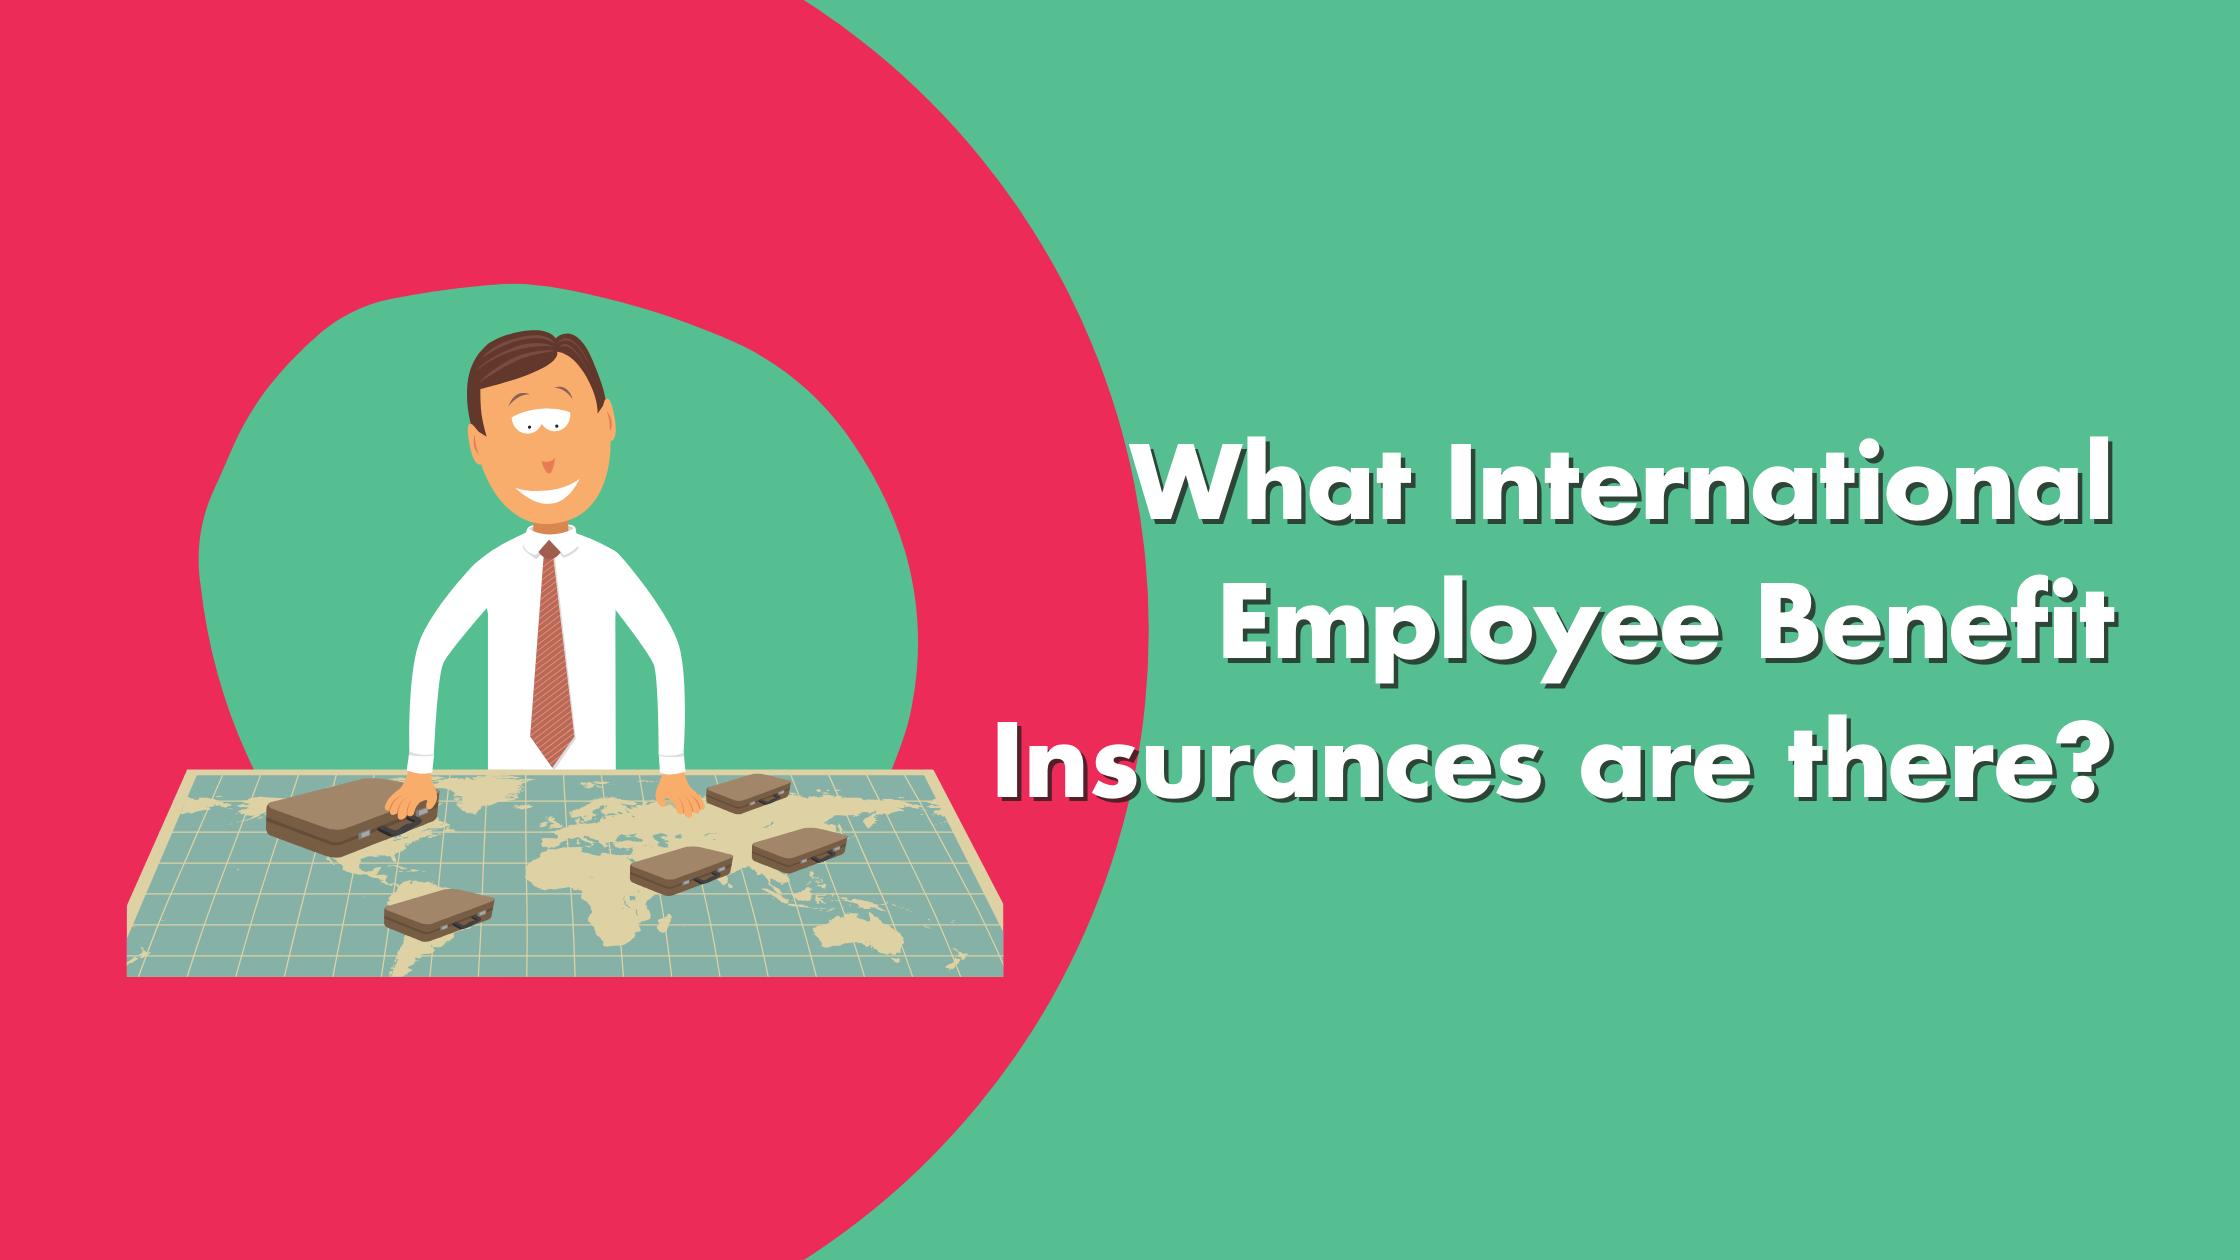 International Employee Benefits Insurances